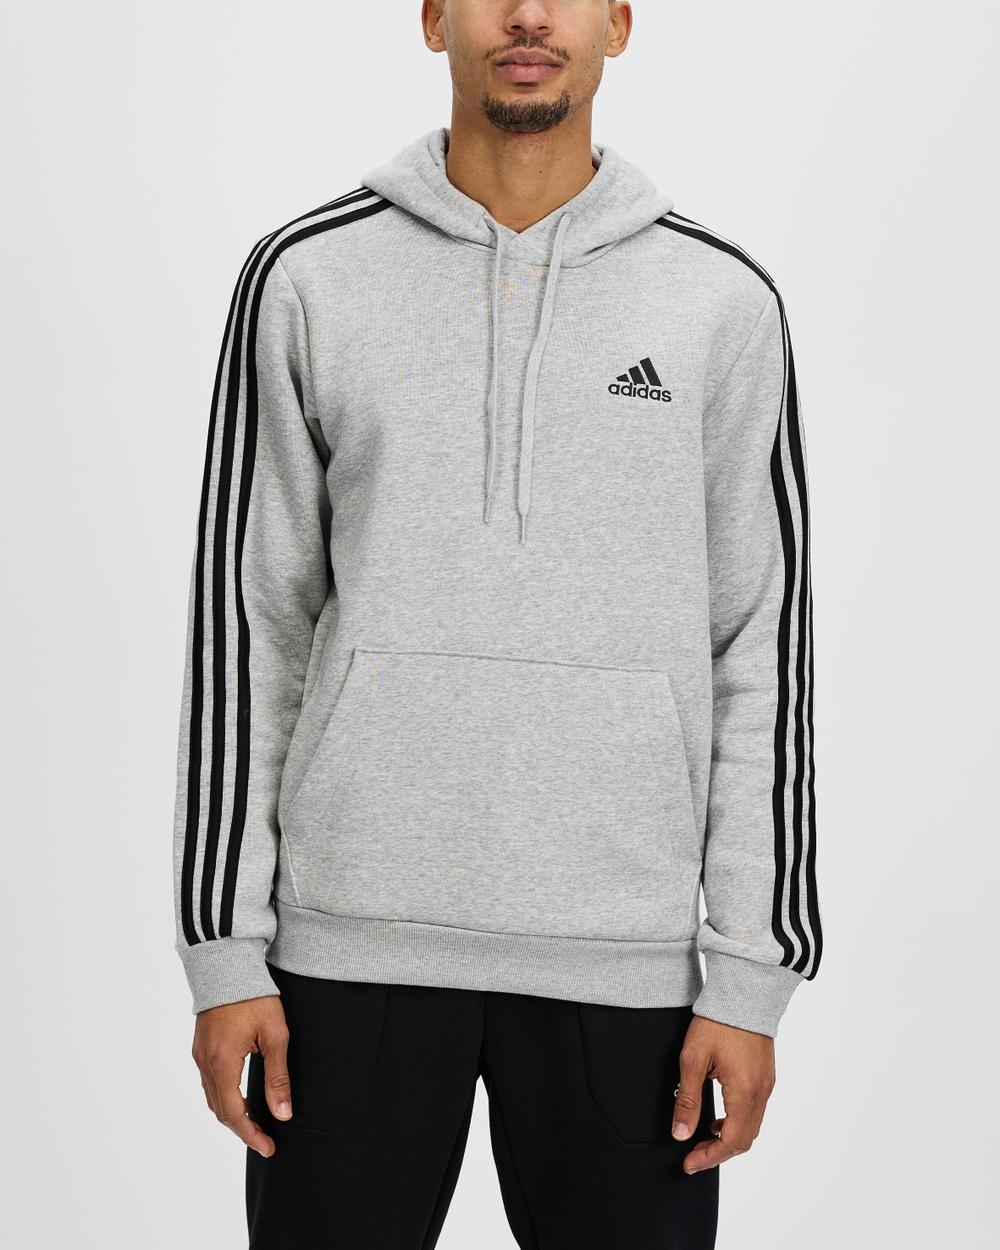 adidas Performance Essentials 3 Stripes Fleece Hoodie Hoodies Medium Grey Heather & Black 3-Stripes